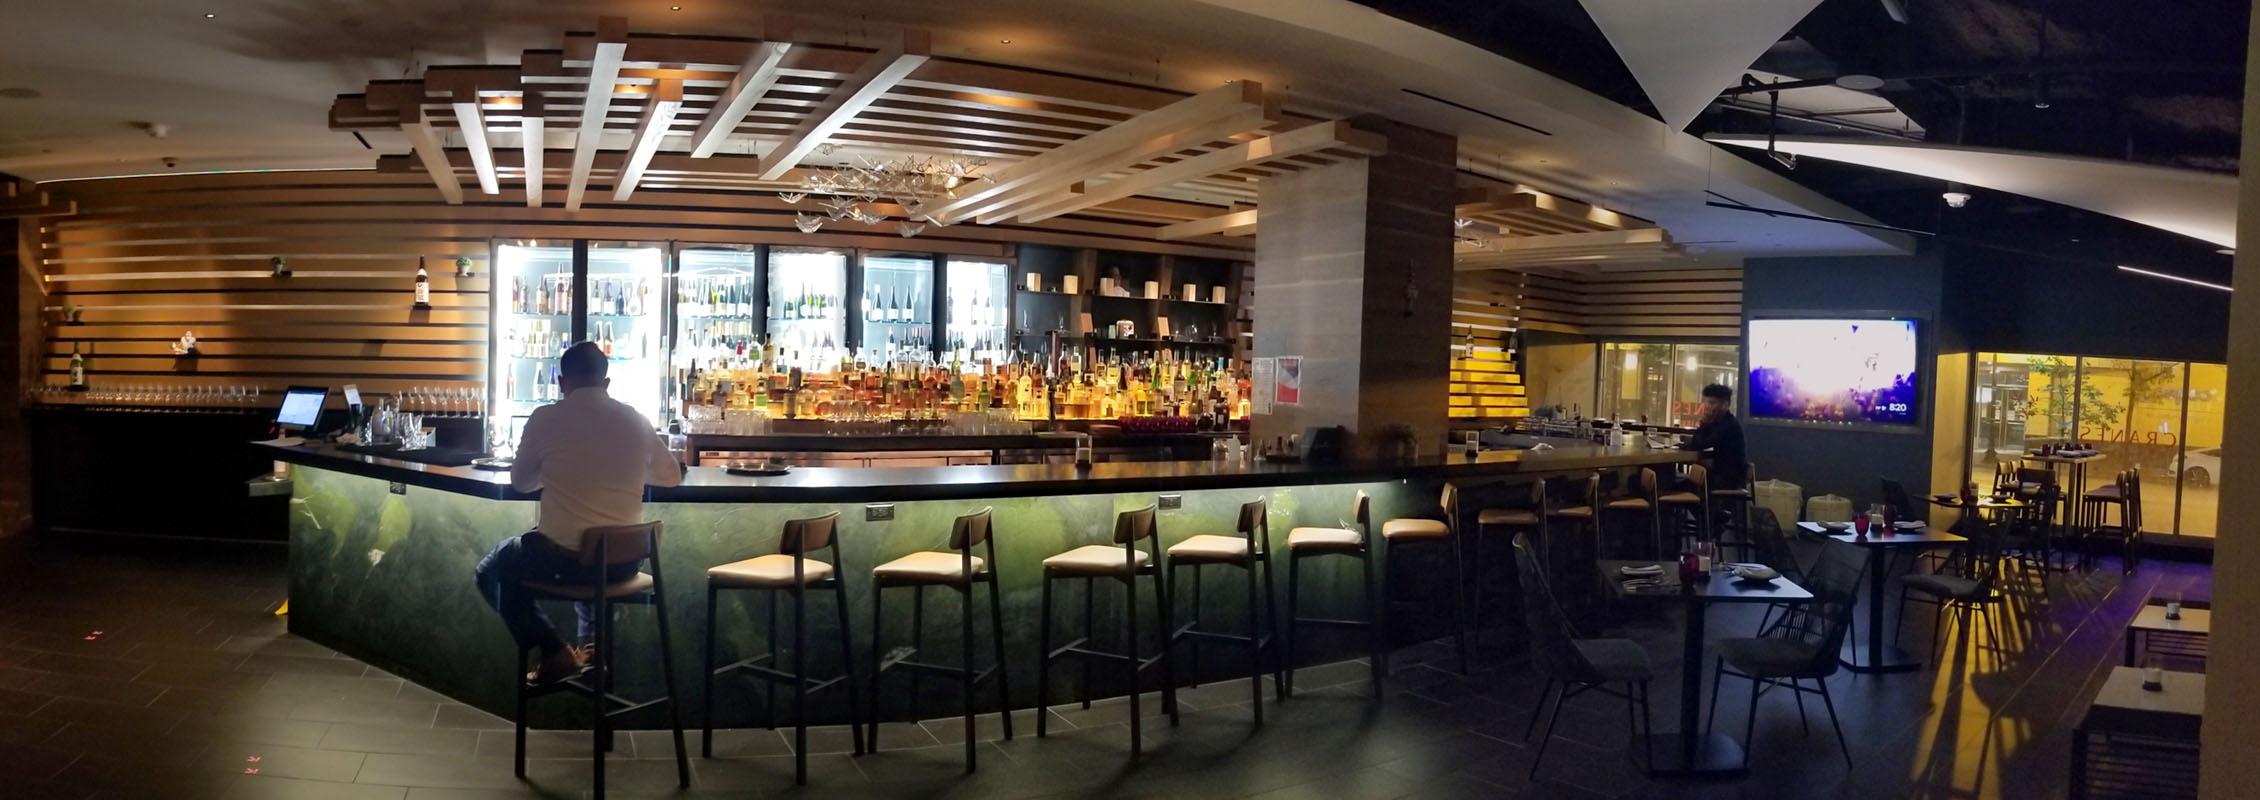 Cranes Bar Area